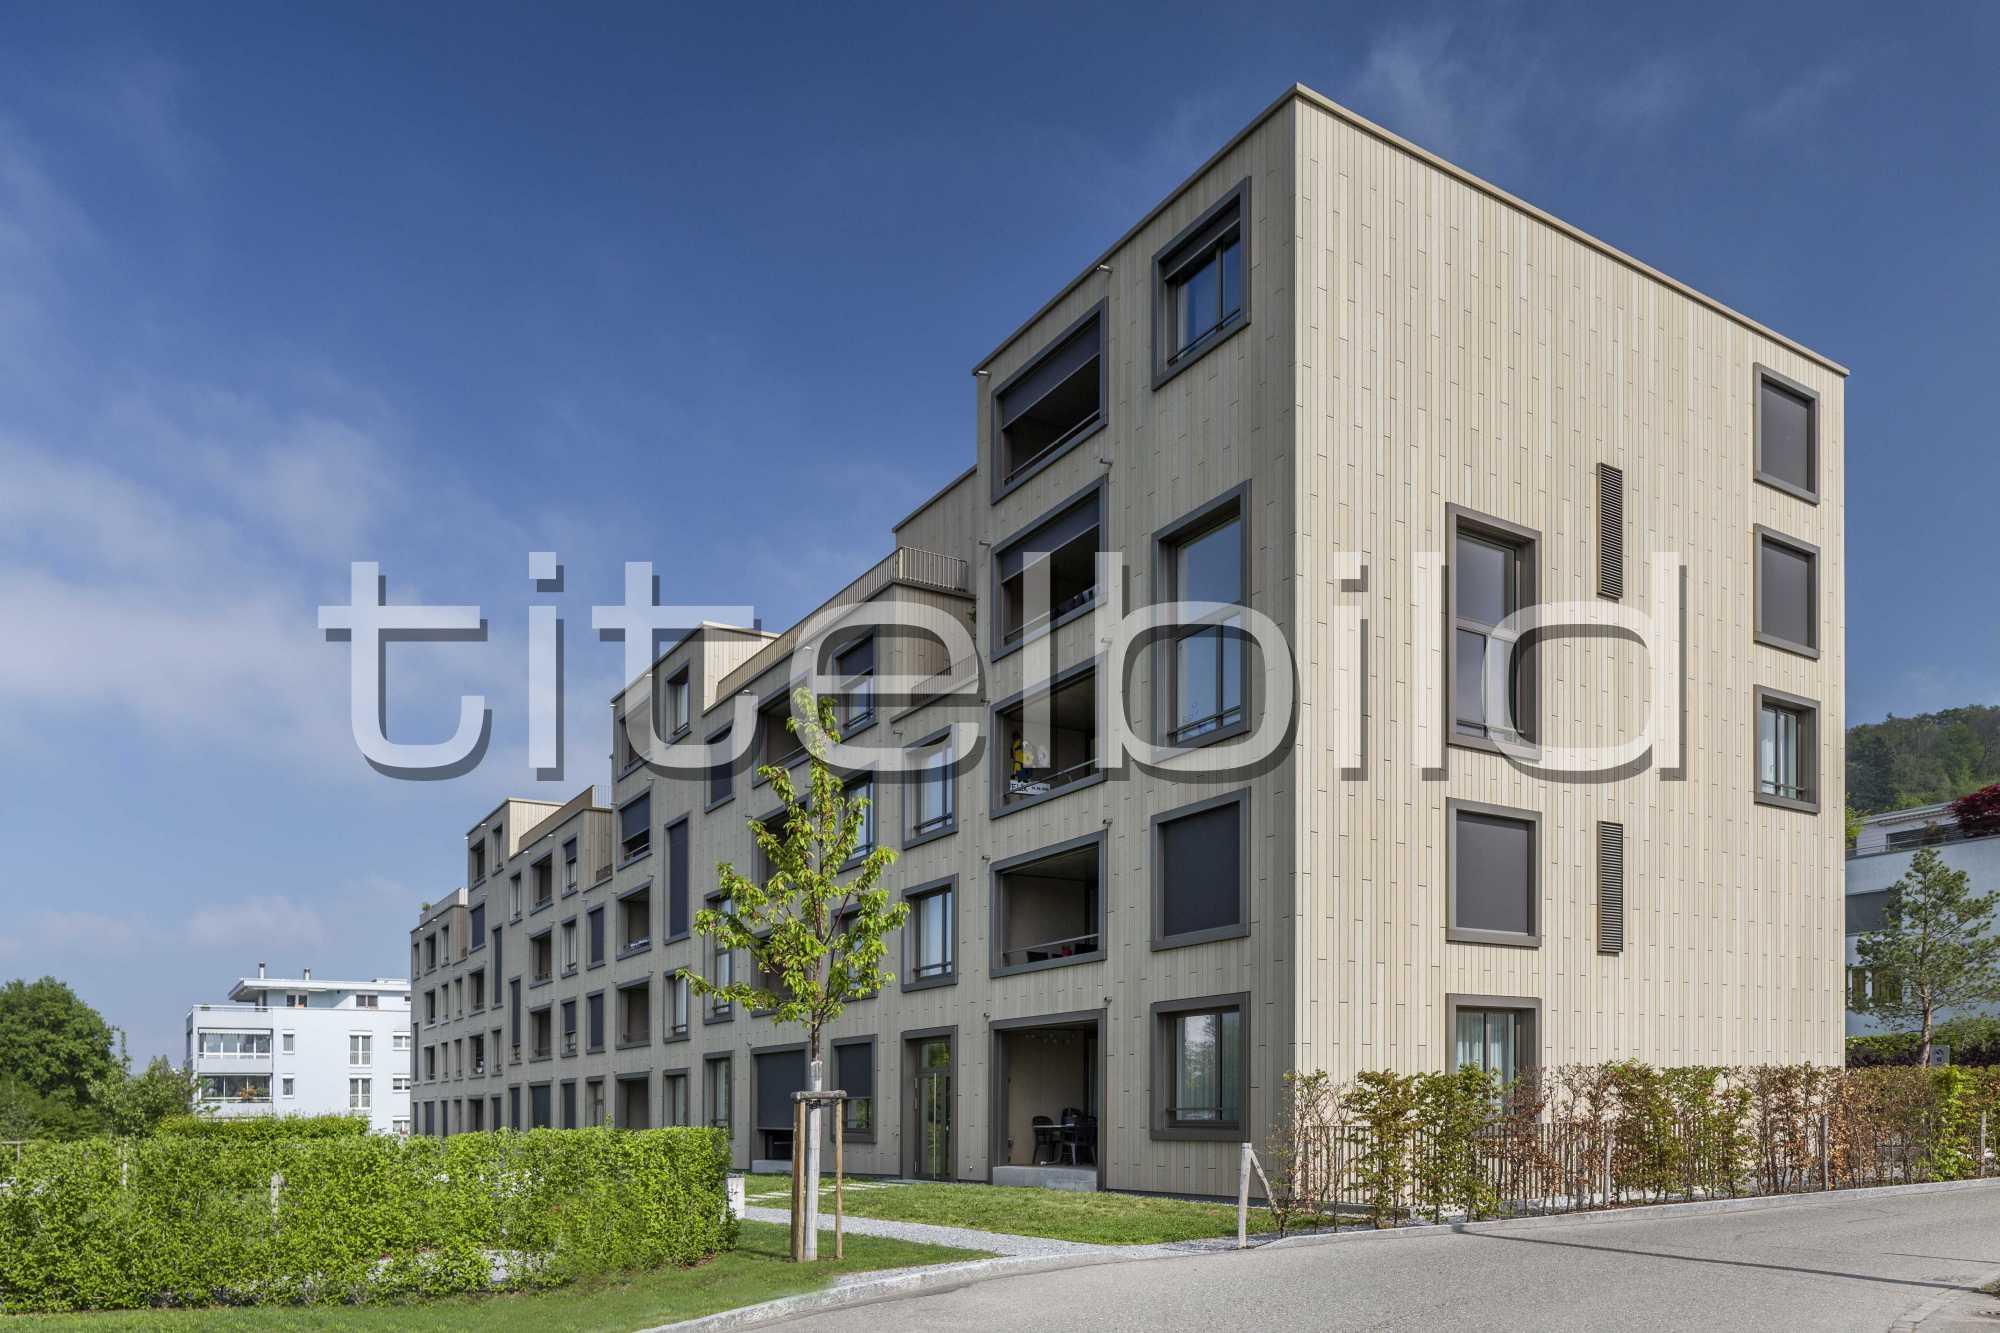 Projektbild-Nr. 3: Wohnsiedlung Neufeld